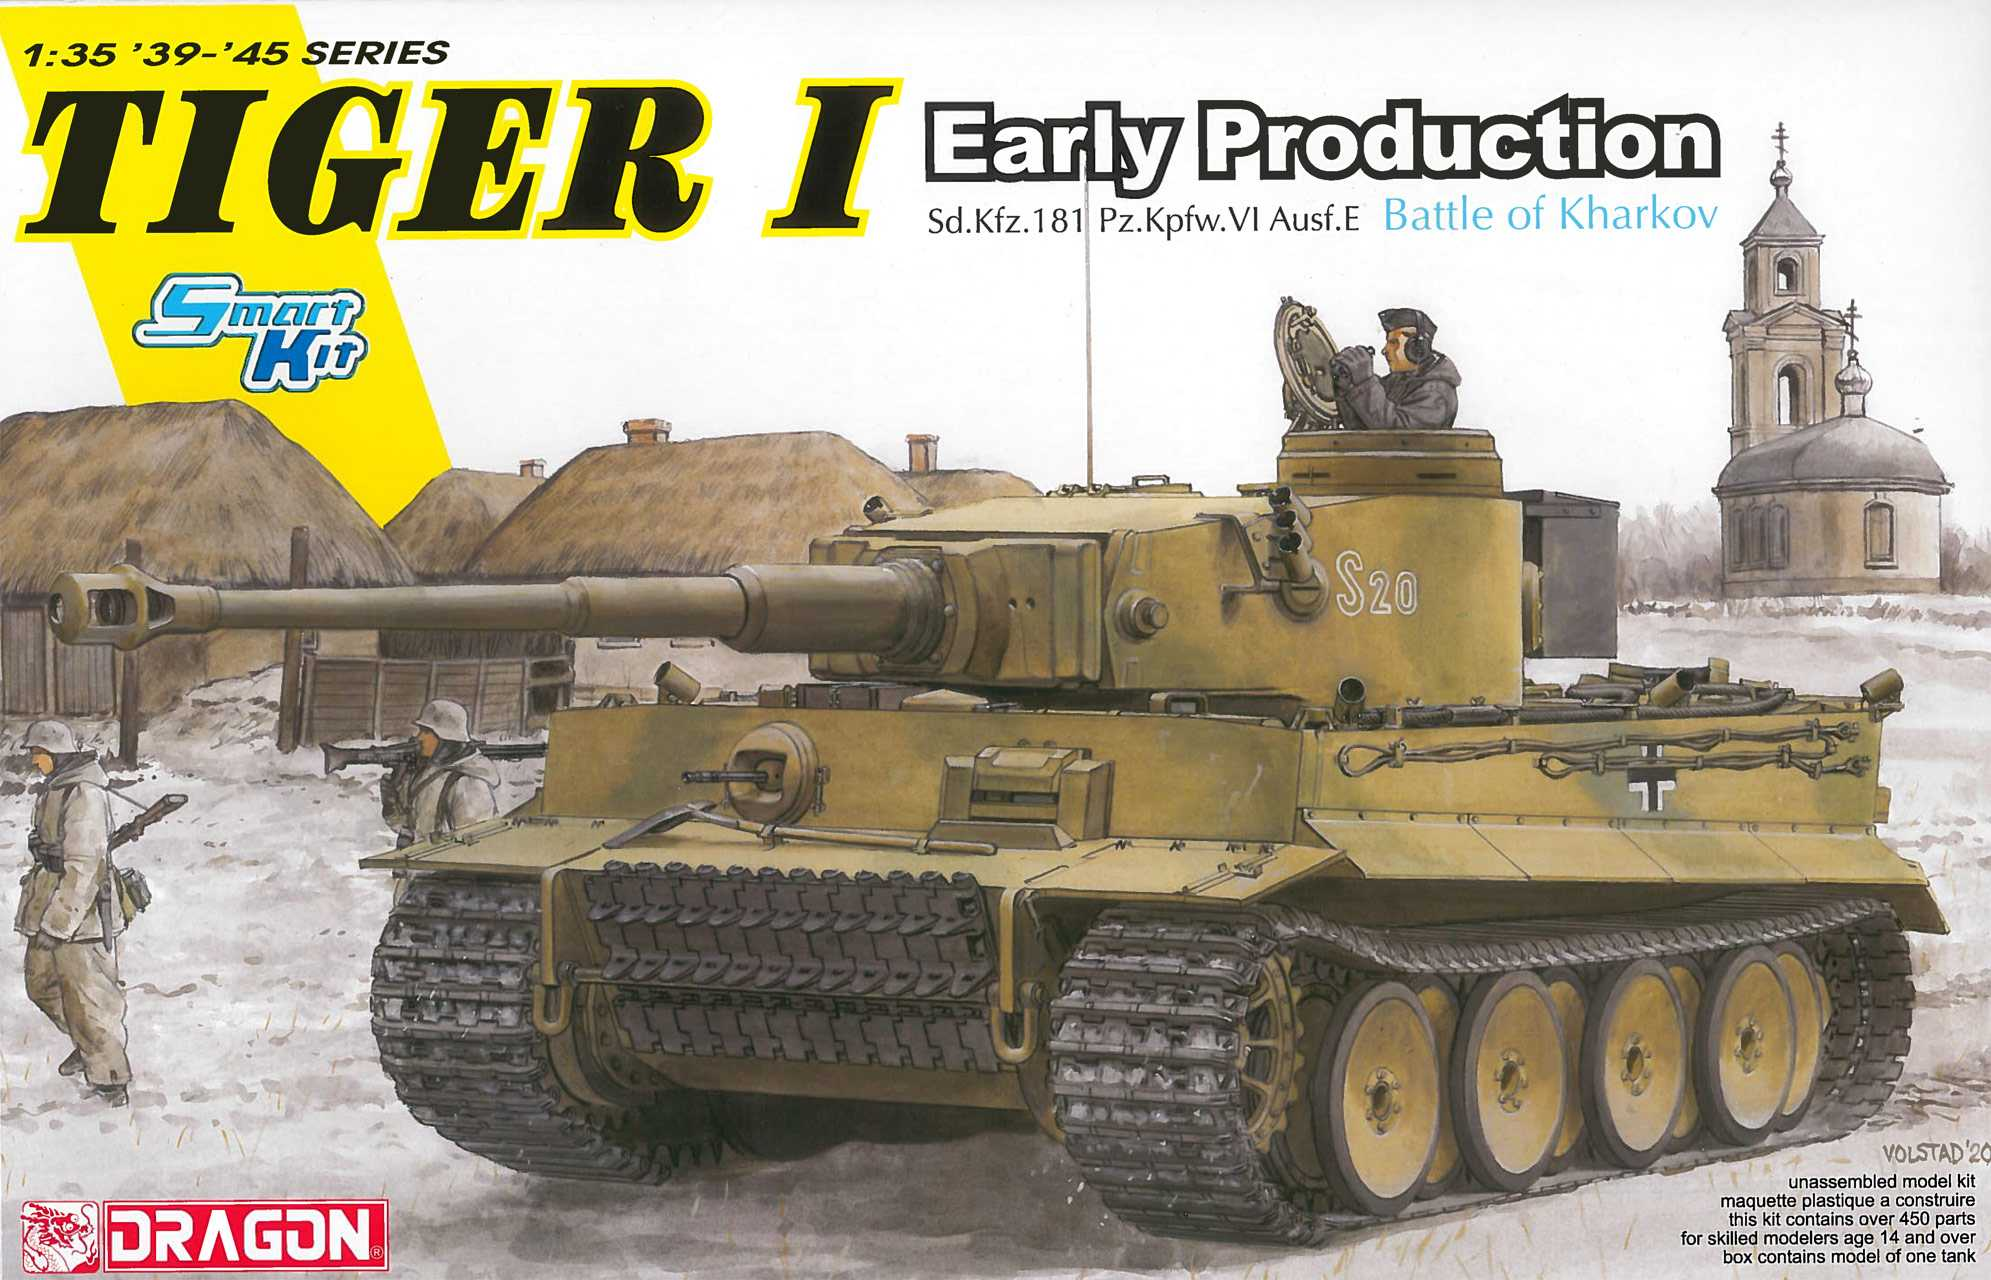 1:35 Tiger I Early Production, Battle of Kharkov